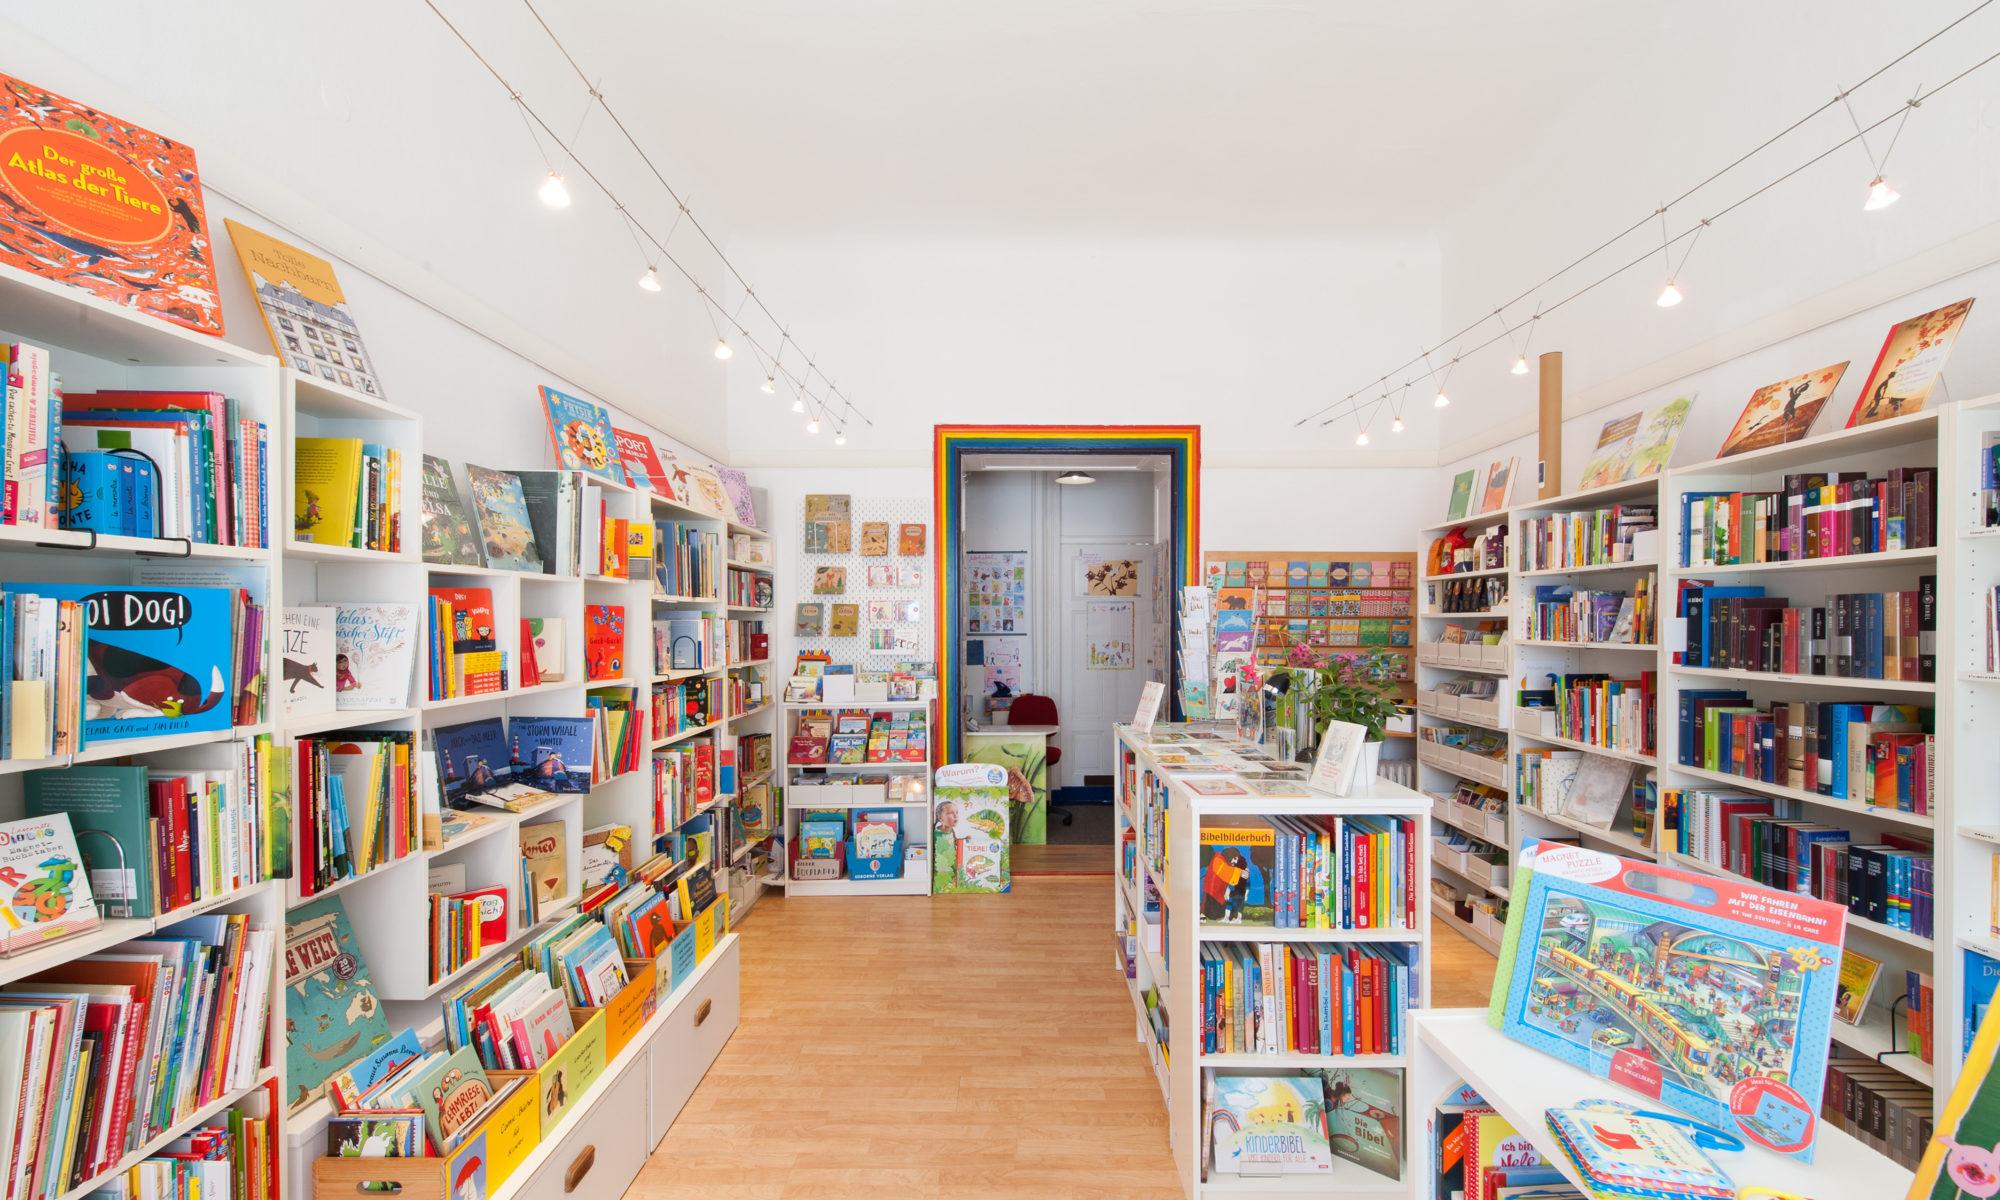 Bilderbuchladen Zossener Straße 6 innen